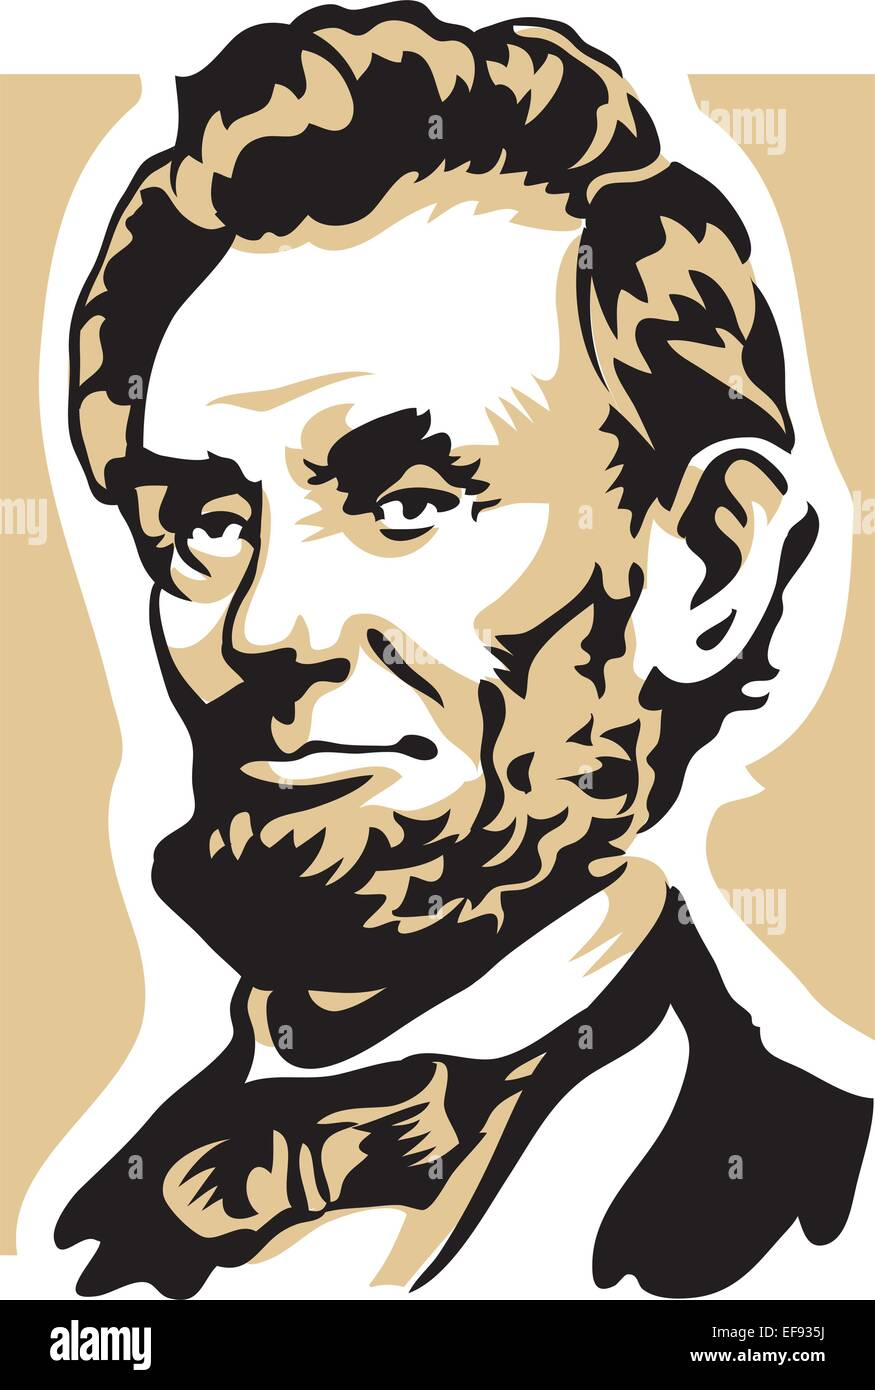 Abraham Lincoln - Stock Vector